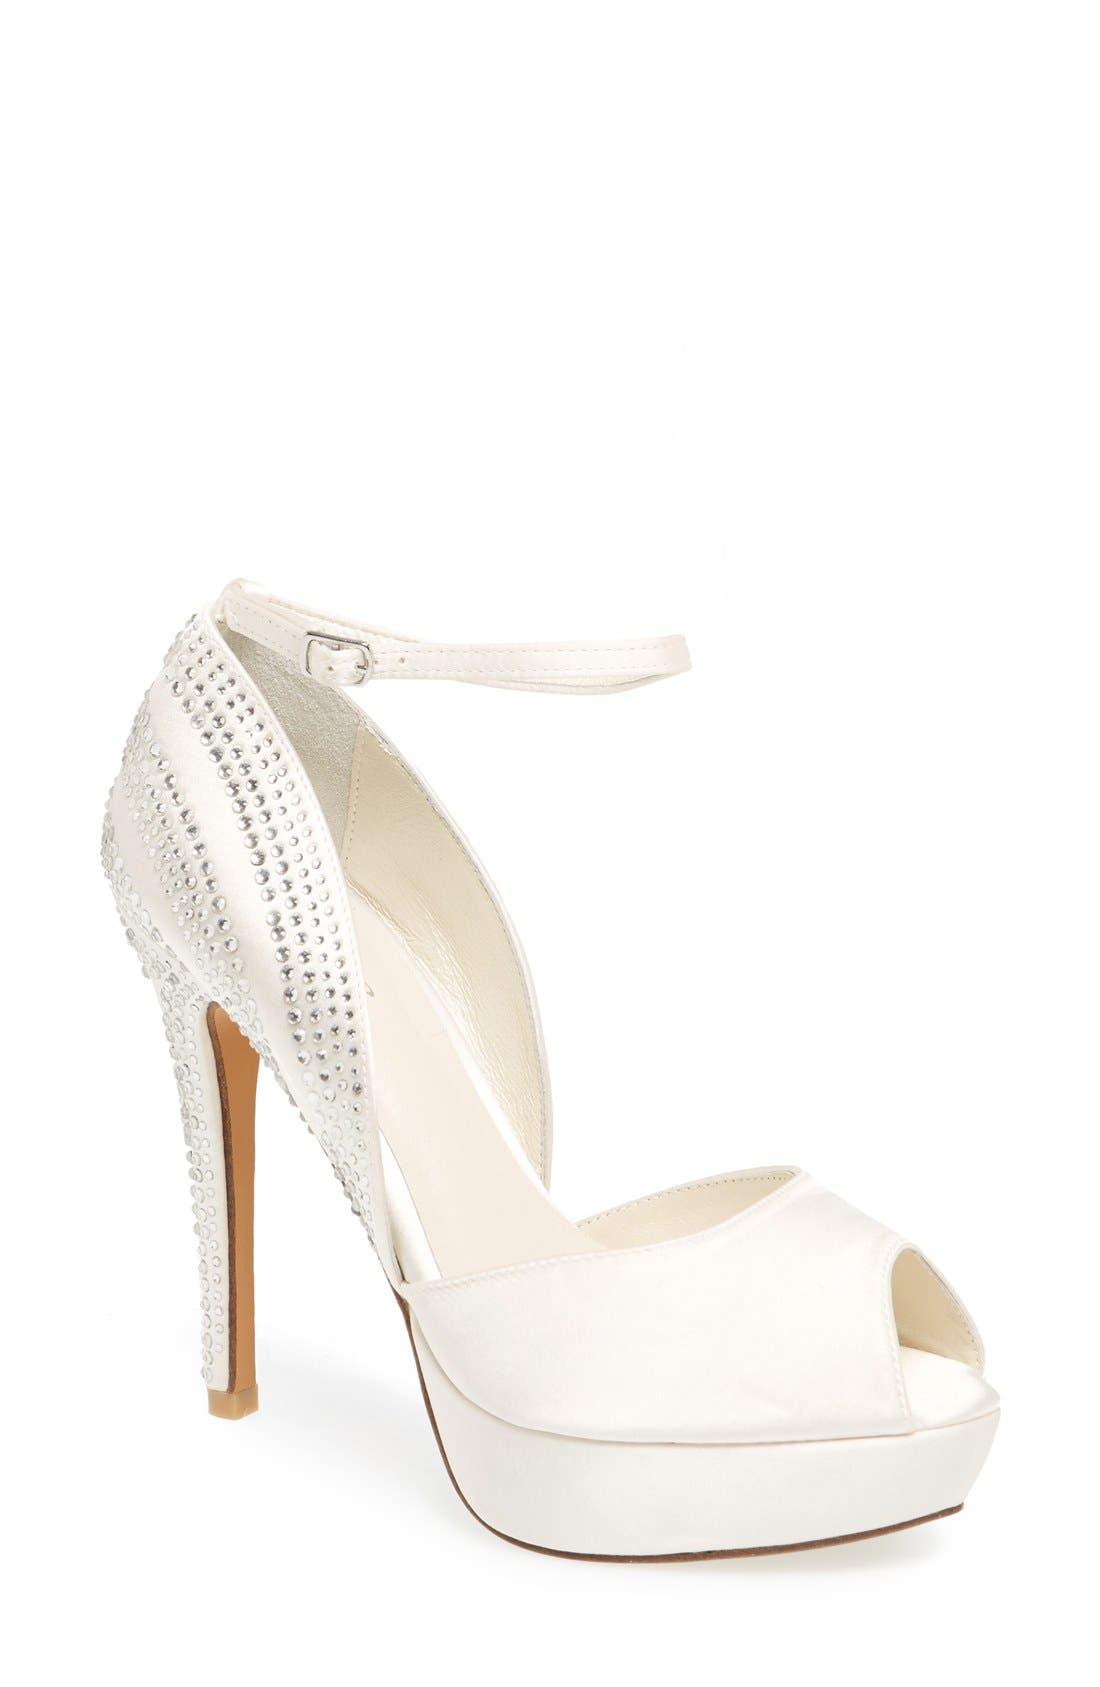 Main Image - Menbur 'Paloma' d'Orsay Platform Sandal (Women)